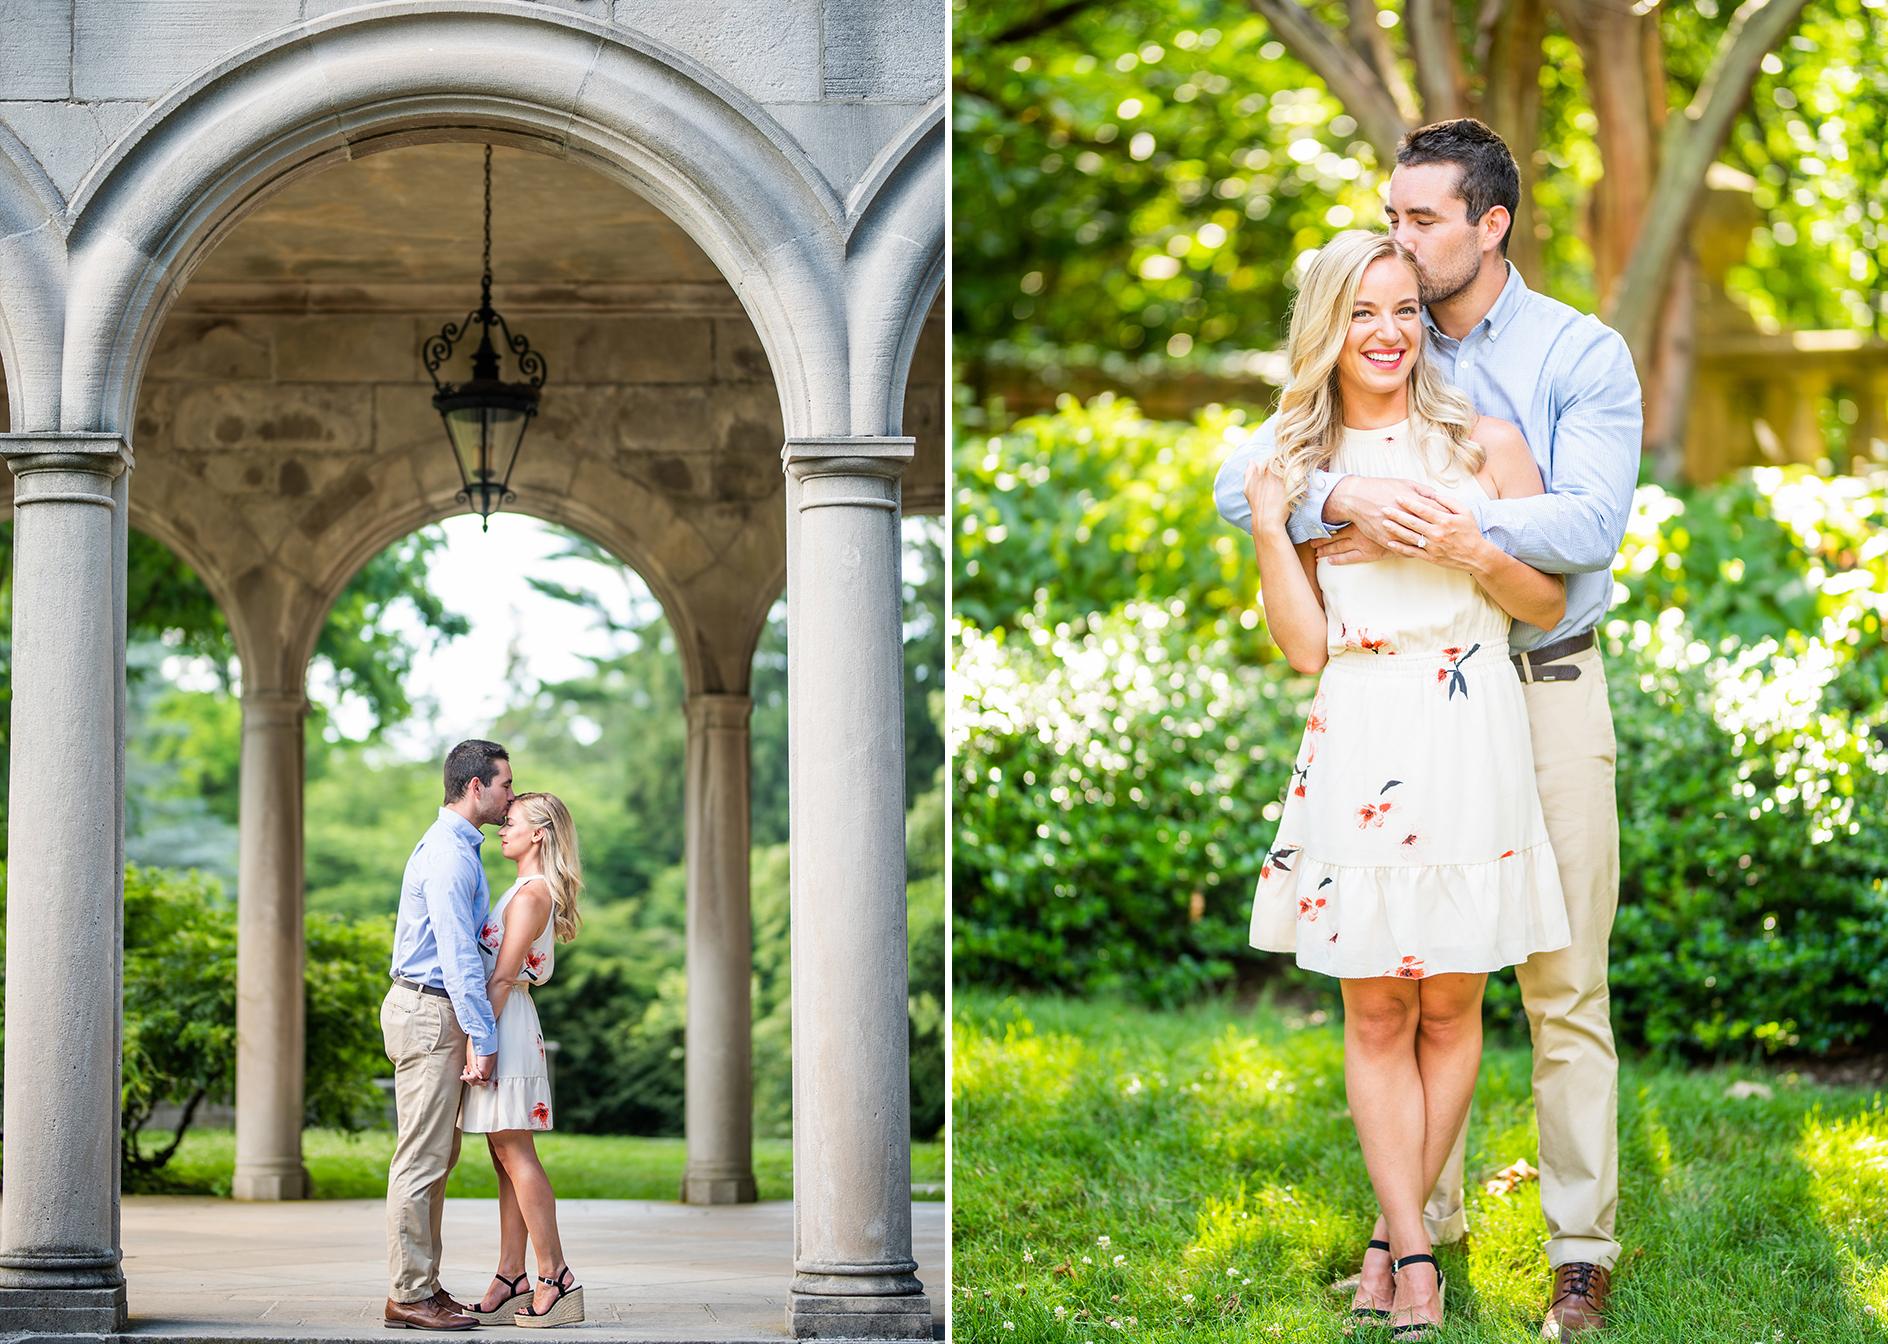 Planting Fields Arboretum Engagement Shoot | Oyster Bay Engagement Shoot | Long Island Wedding Photographer4